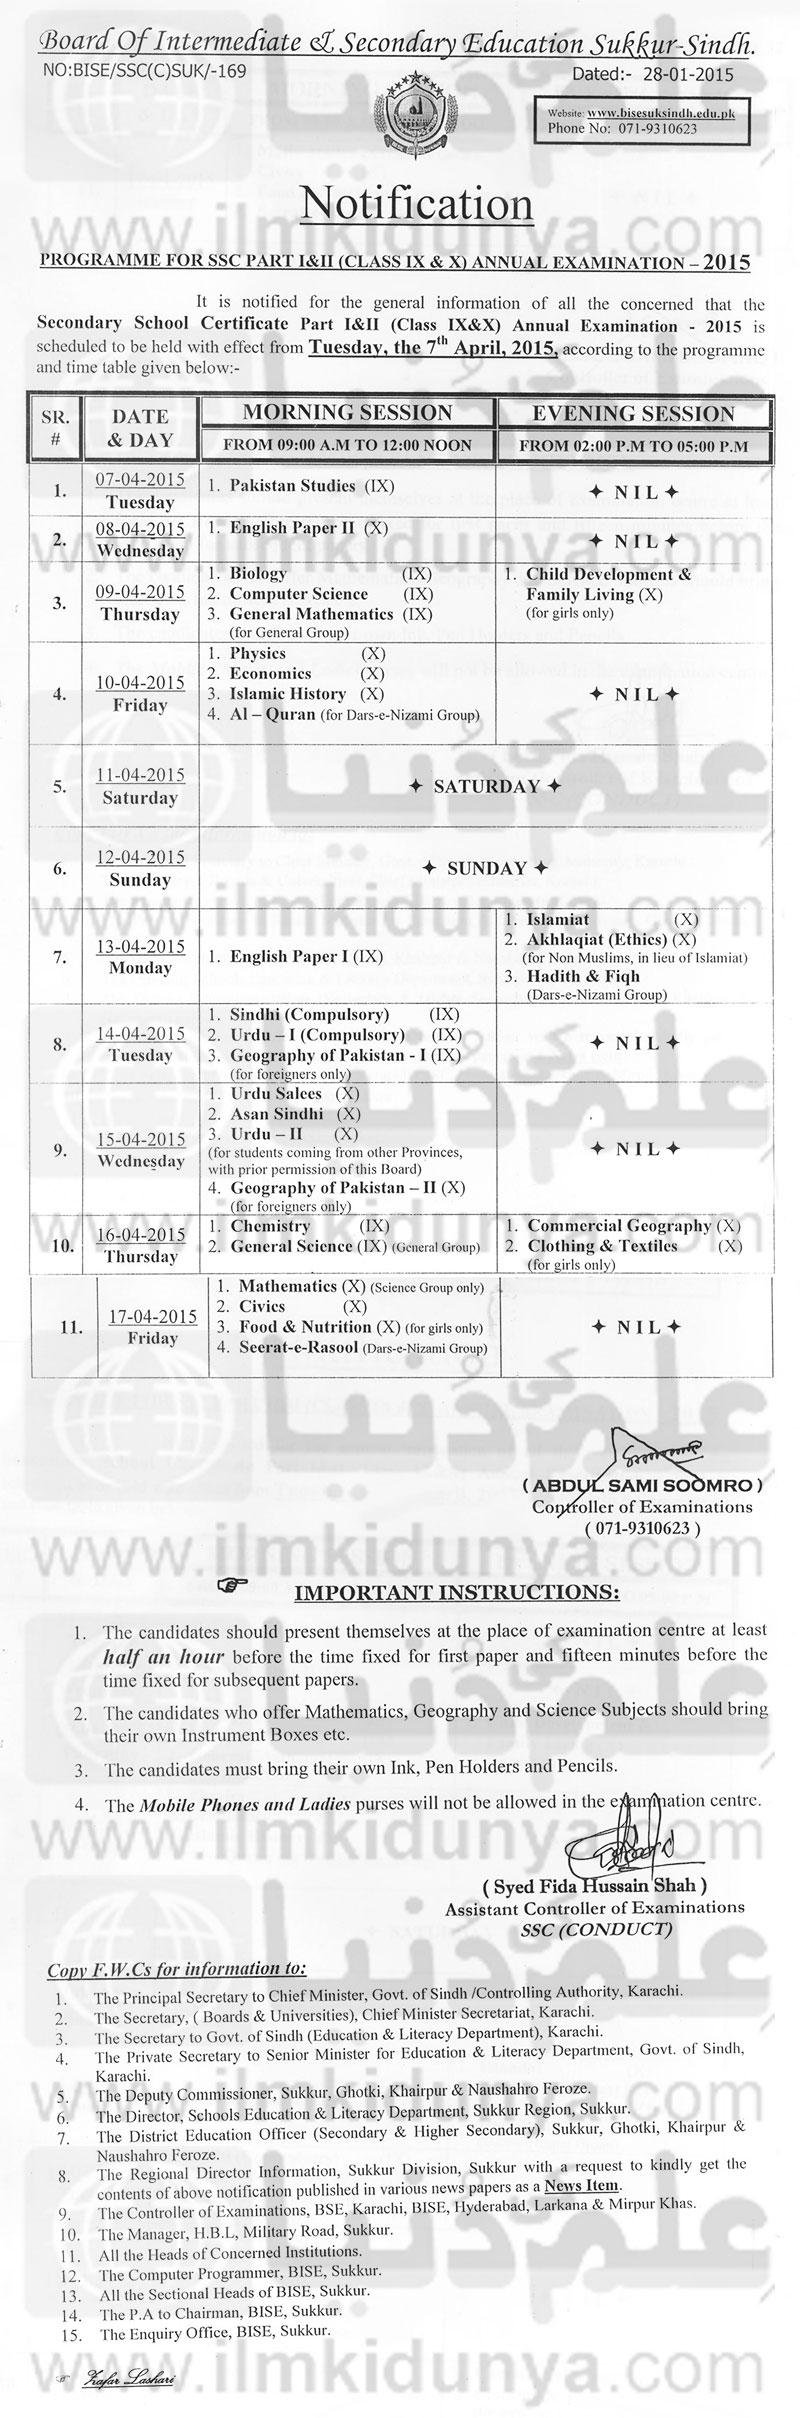 9Th class date sheet 2015 gujranwala board free download